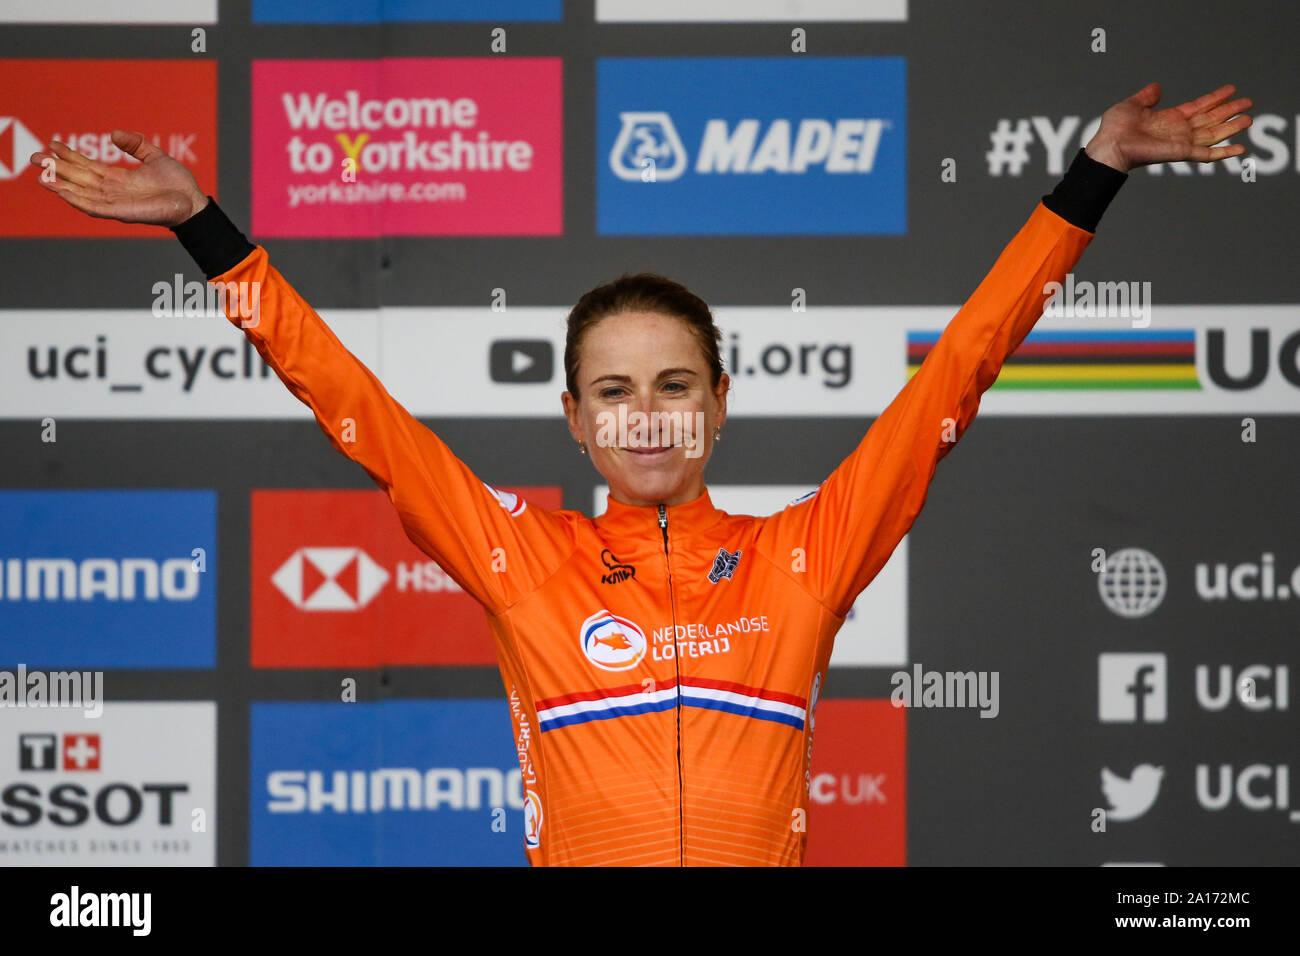 Harrogate, UK. 24th September 2019. 2019 UCI Road World Championships Womens Elite Individual Time Trial. September 24, 2019 Credit Dan-Cooke/Alamy Live News Stock Photo